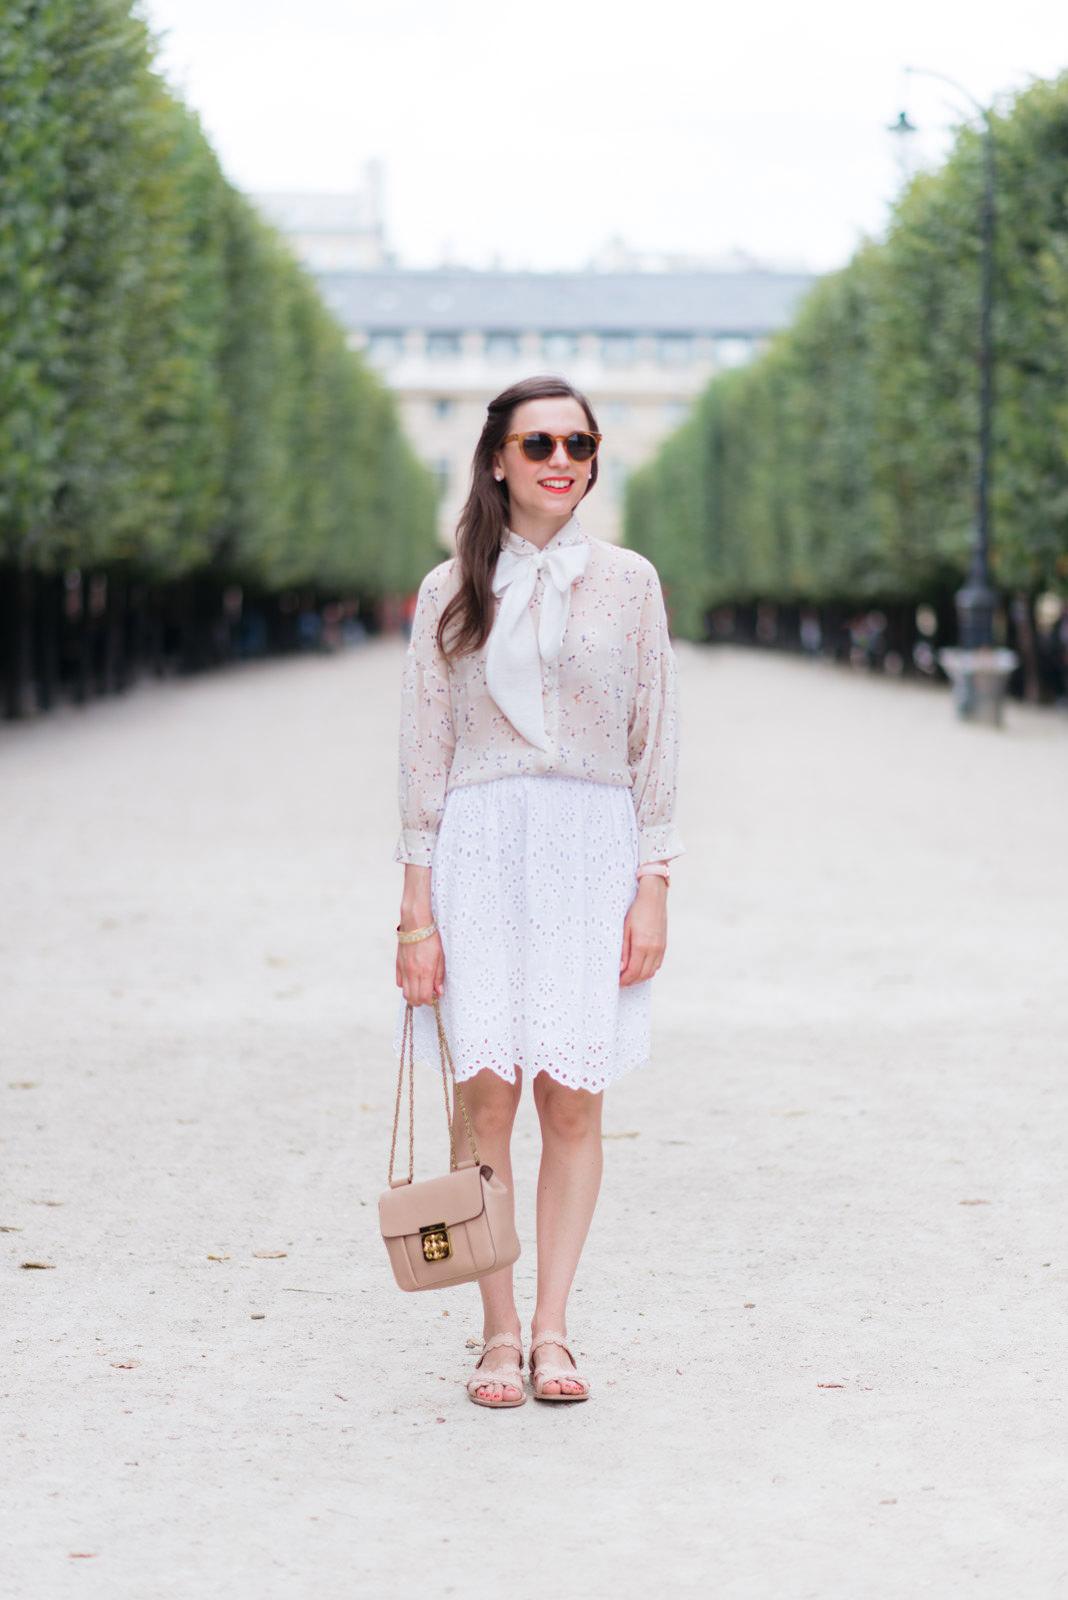 Blog-Mode-And-The-City-Looks-Blouse-Sister-Jane-Palais-Royal-3